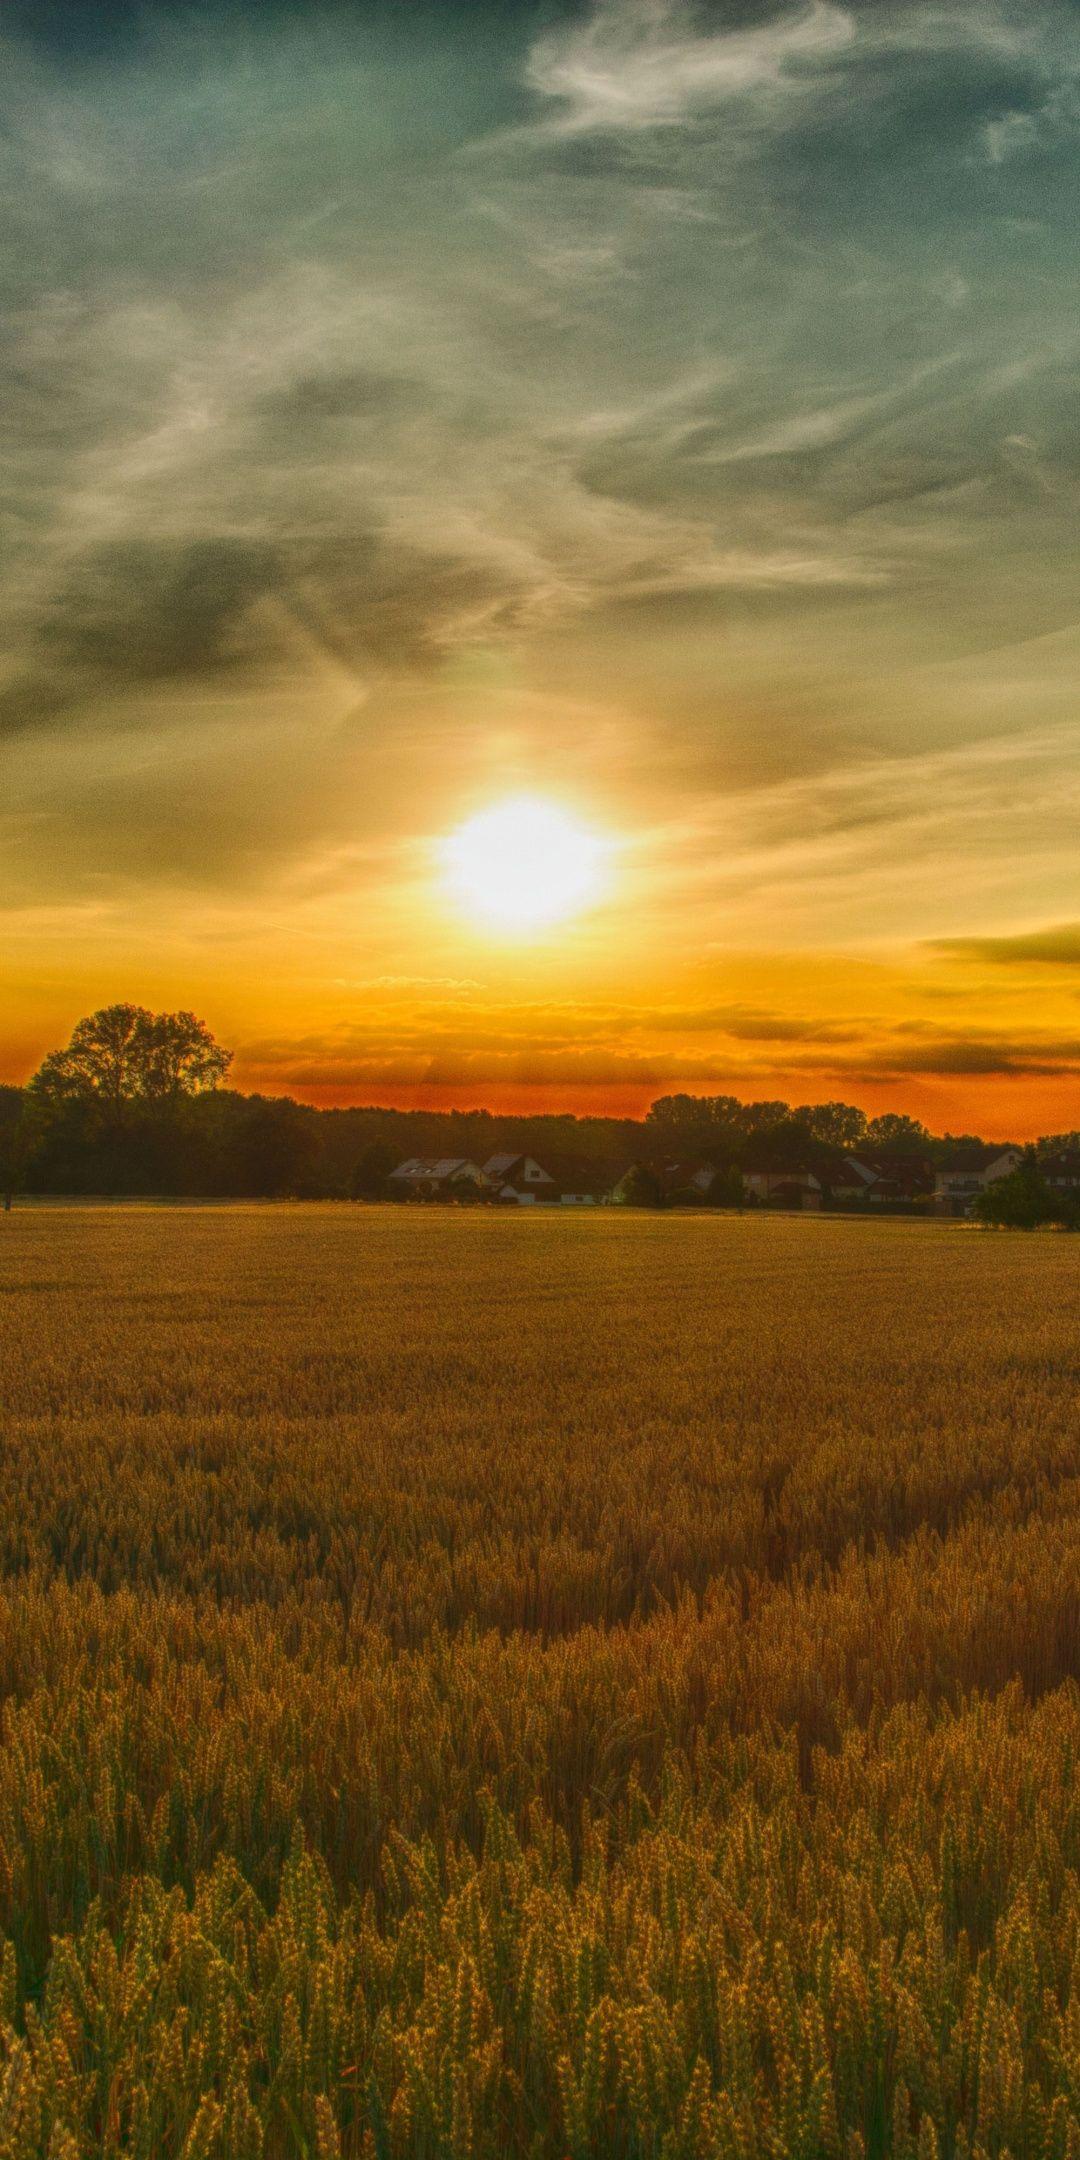 Summer Sunset Farm Landscape Nature 1080x2160 Wallpaper Farm Scenery Landscape Photography Landscape Pictures